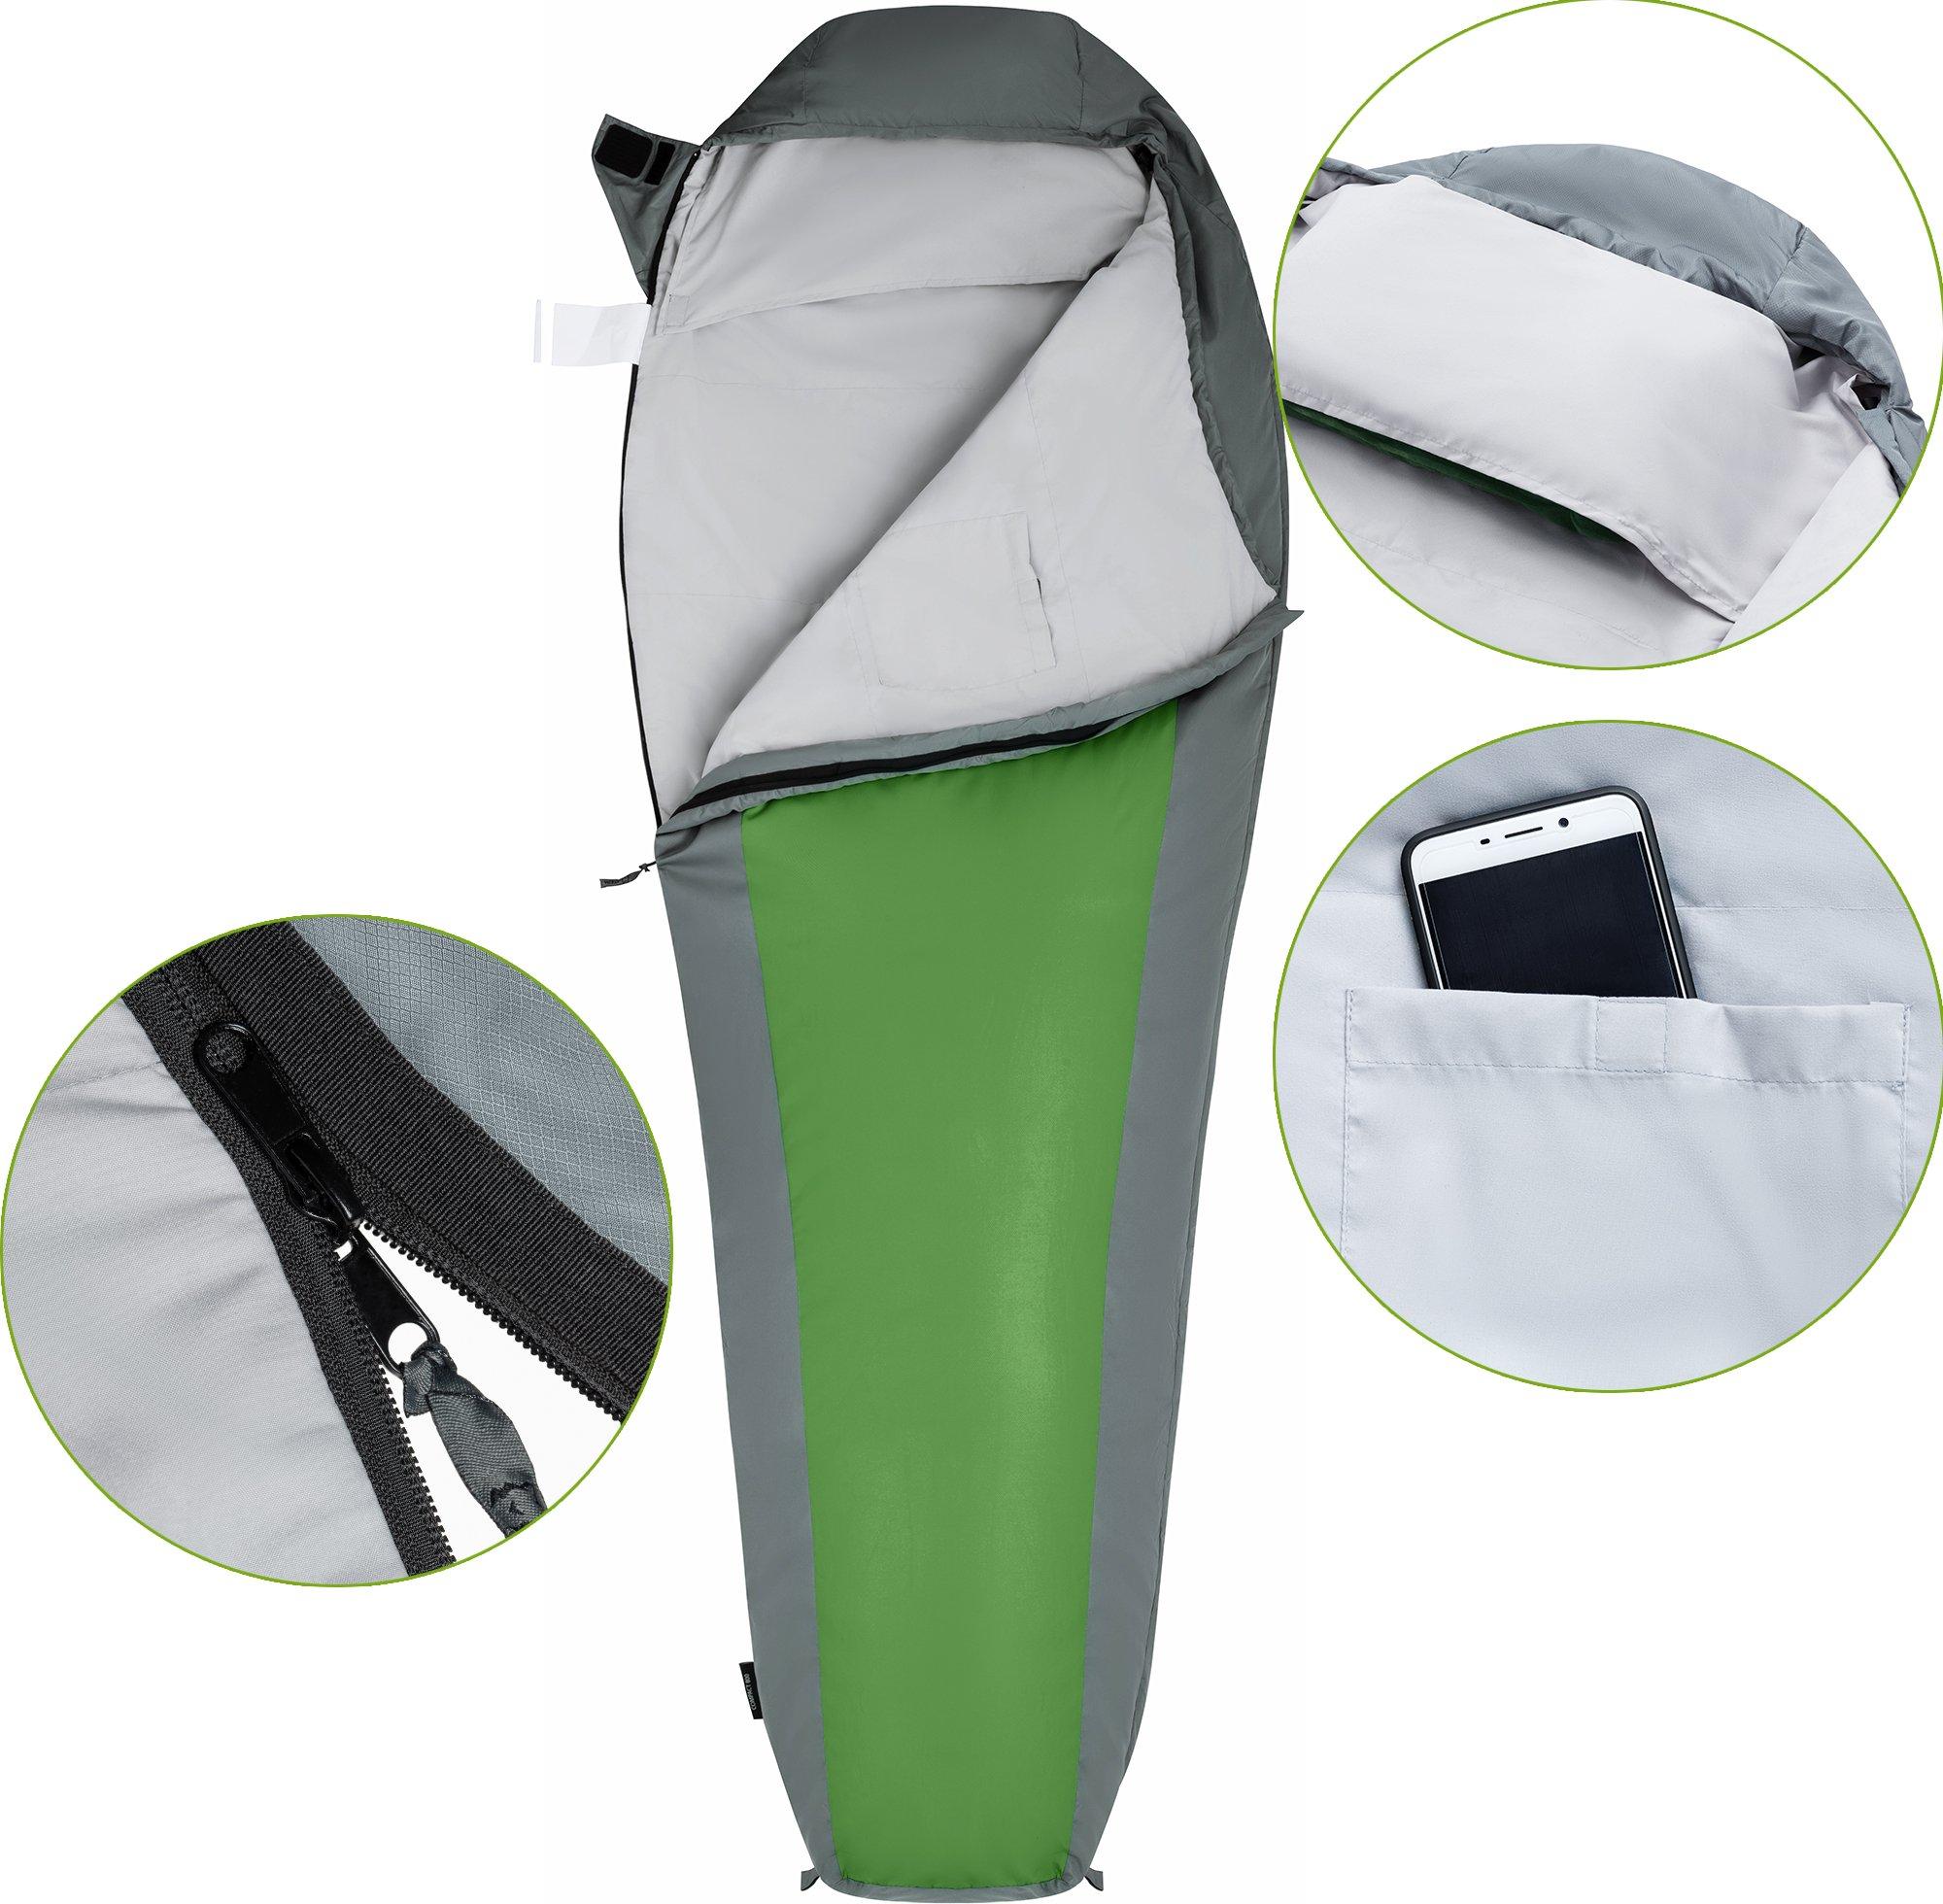 ATEPA Ultra-light Durable Comfort 3-season 32 Degree F Backpacking Camping Envelope Adult Sleeping Bag